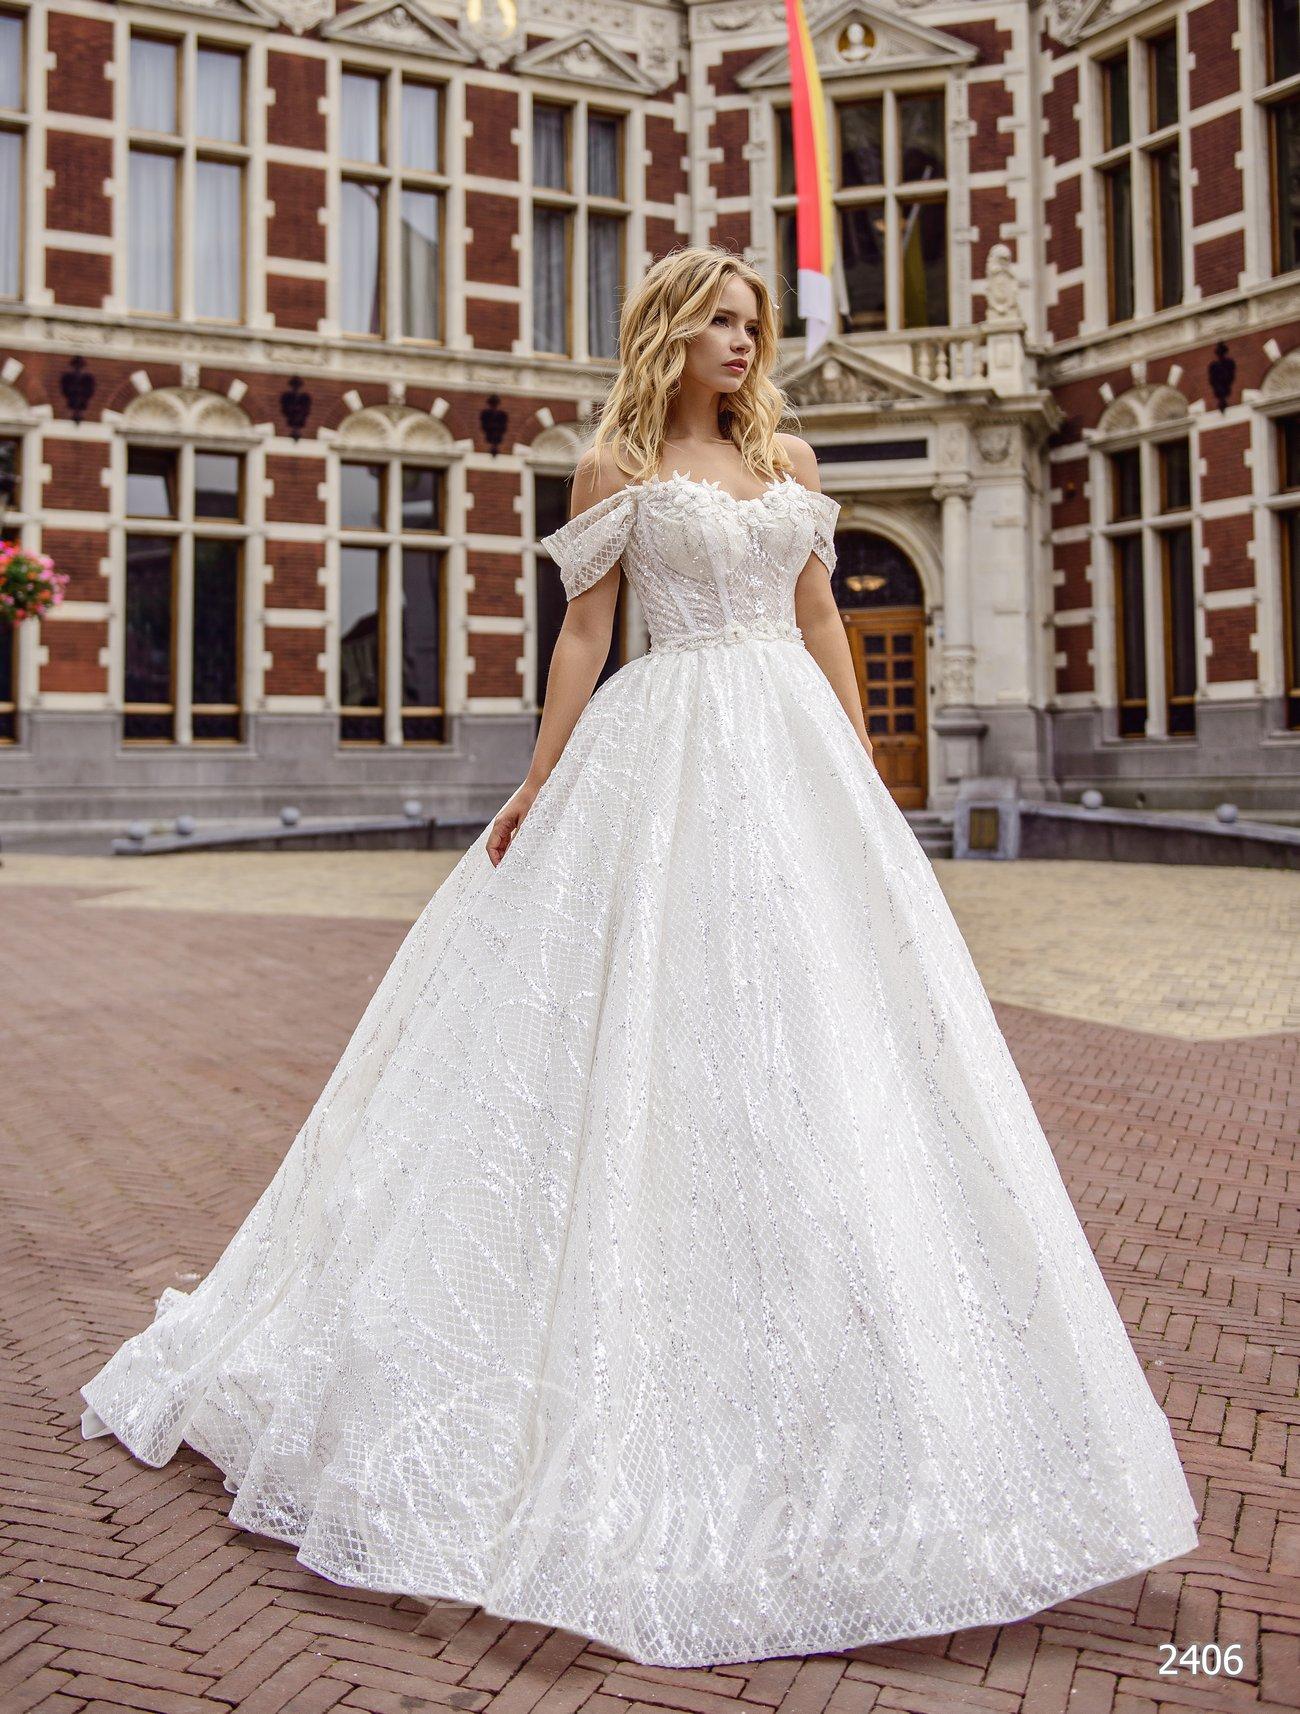 Quinceanera wedding dress with half-mast straps| Buy wedding dresses wholesale from Pentelei